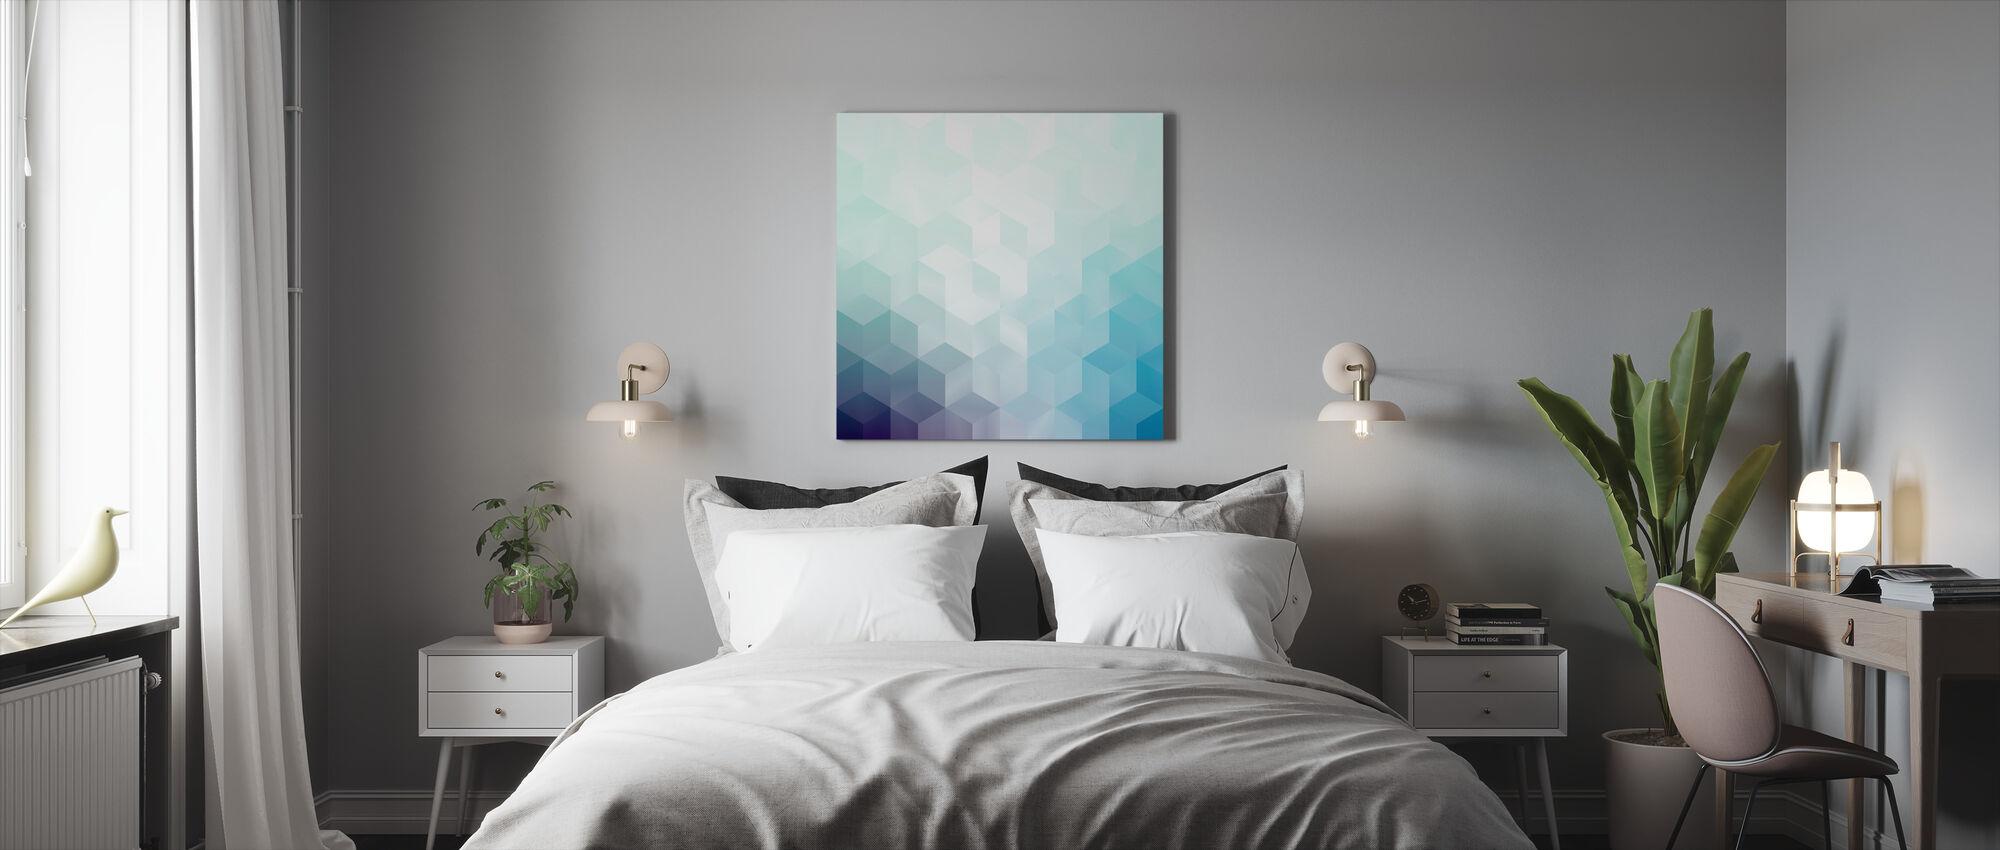 Koel abstract patroon - Canvas print - Slaapkamer